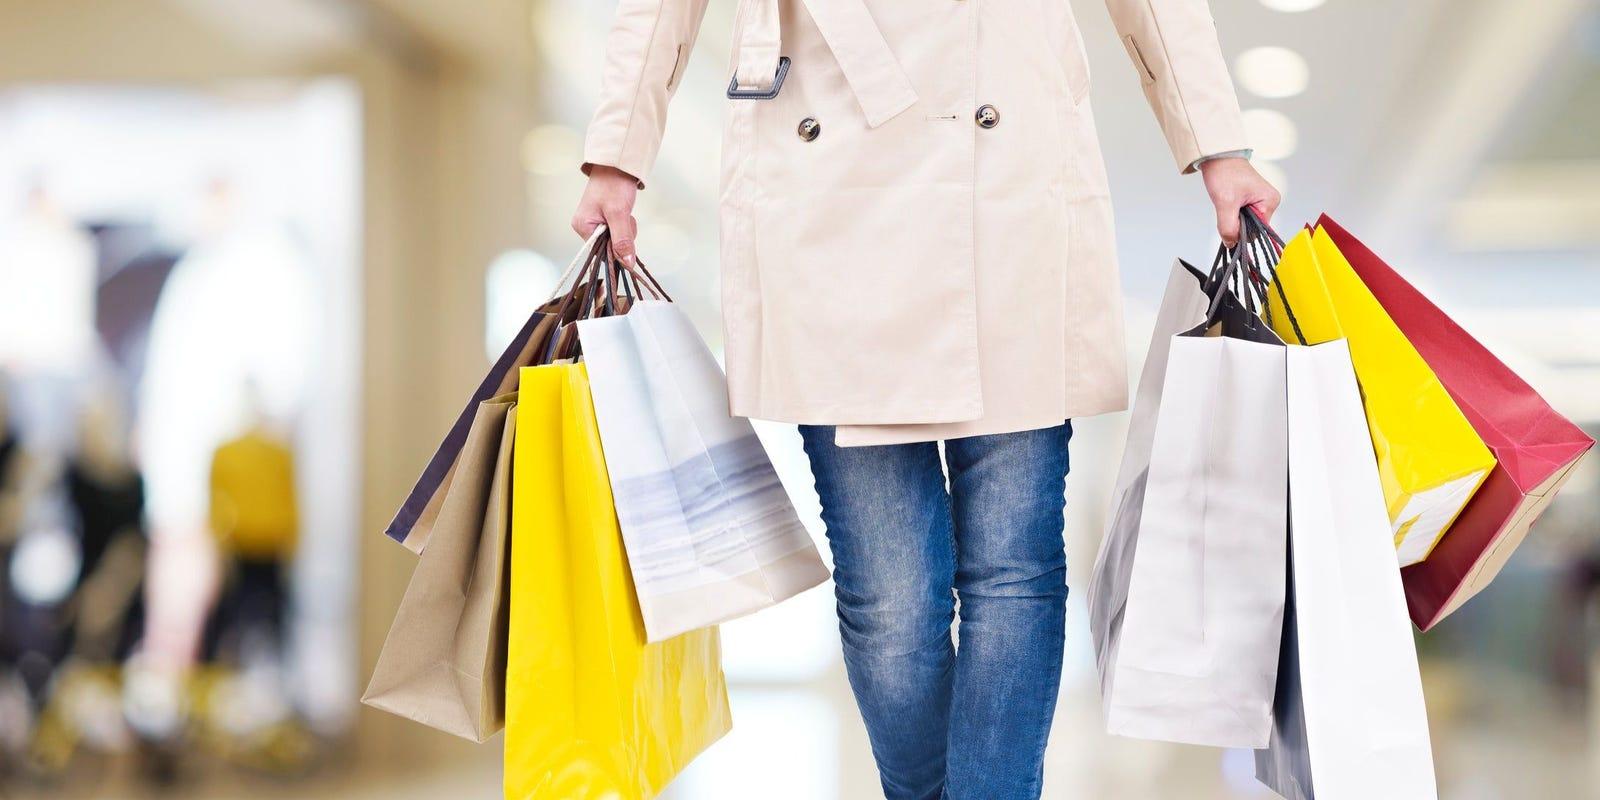 Walmart, Best Buy, Target on list